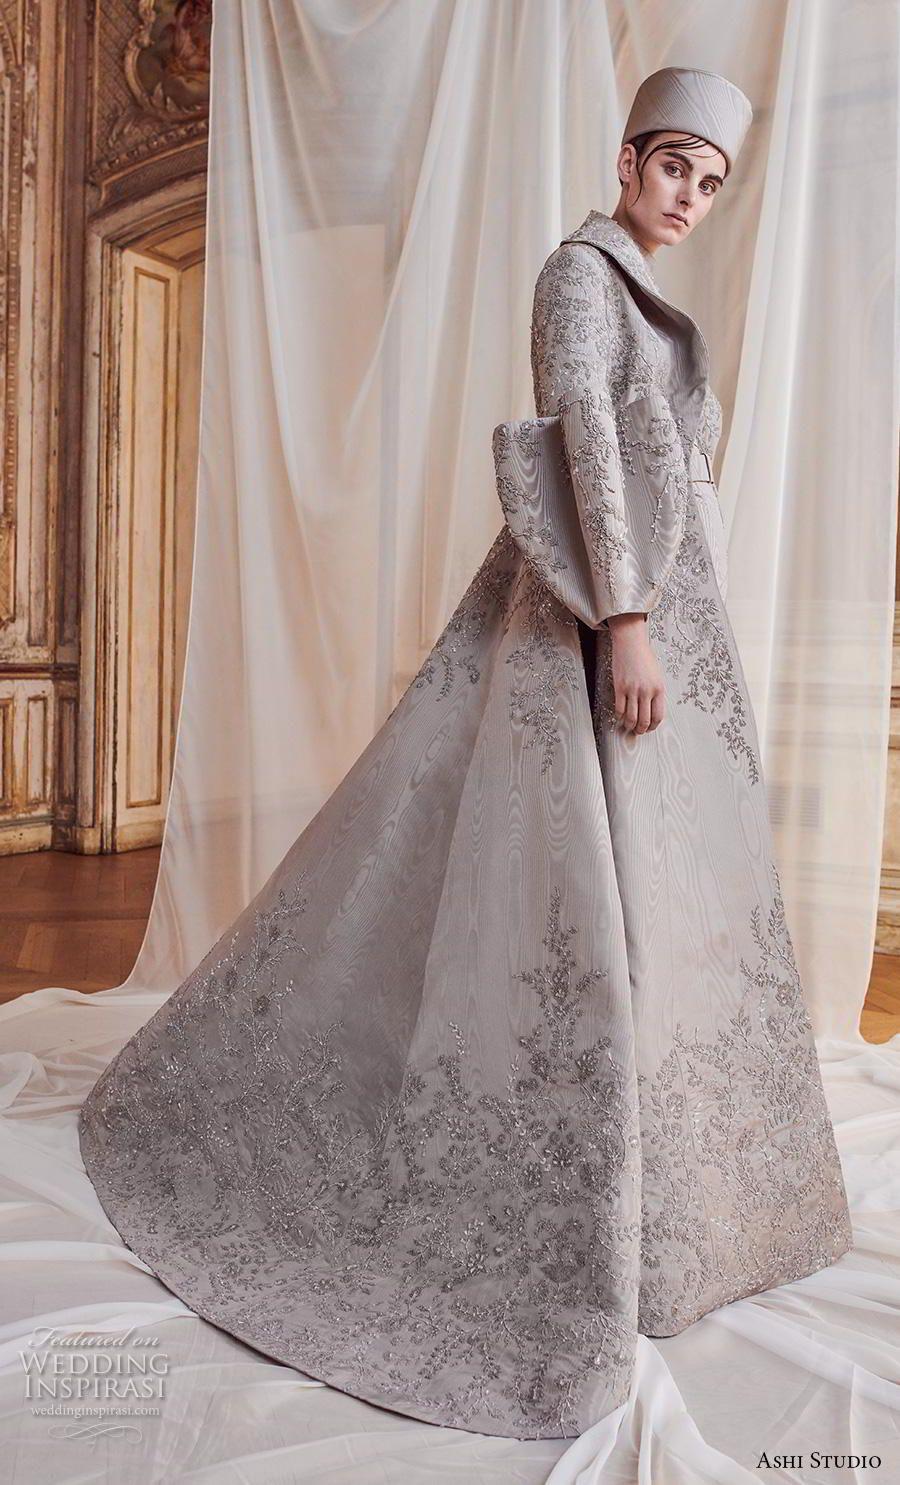 afebbf0b160 ashi studio fall winter 2019 bridal modern glamorous grey jacket outfit --  Ashi Studio Fall Winter 2018-2019 Couture Collection